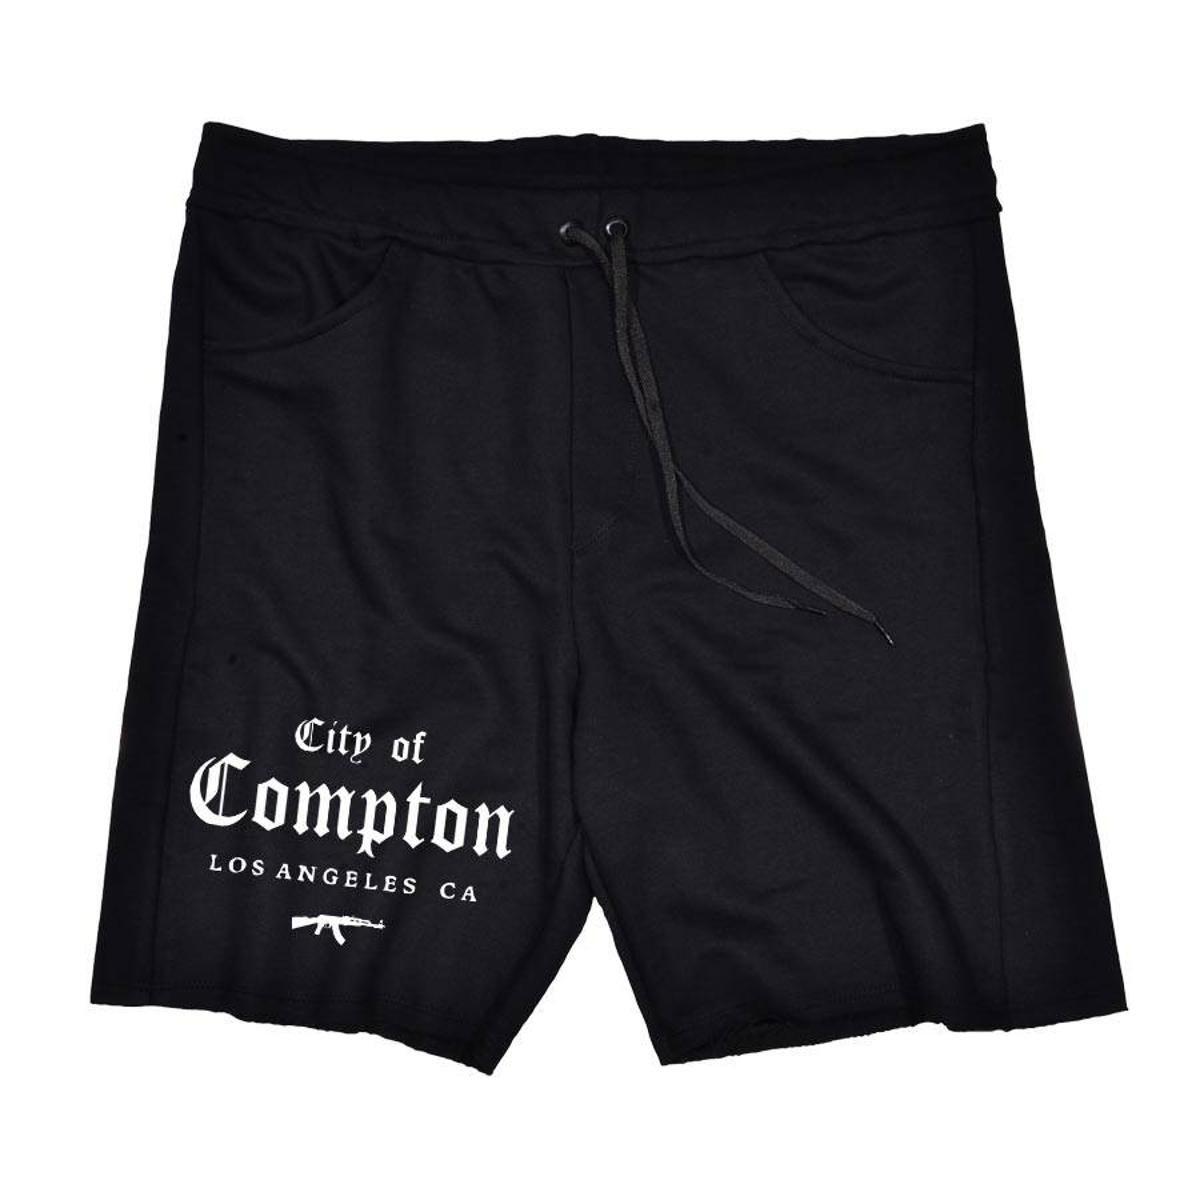 Bermuda Moletom City of Compton